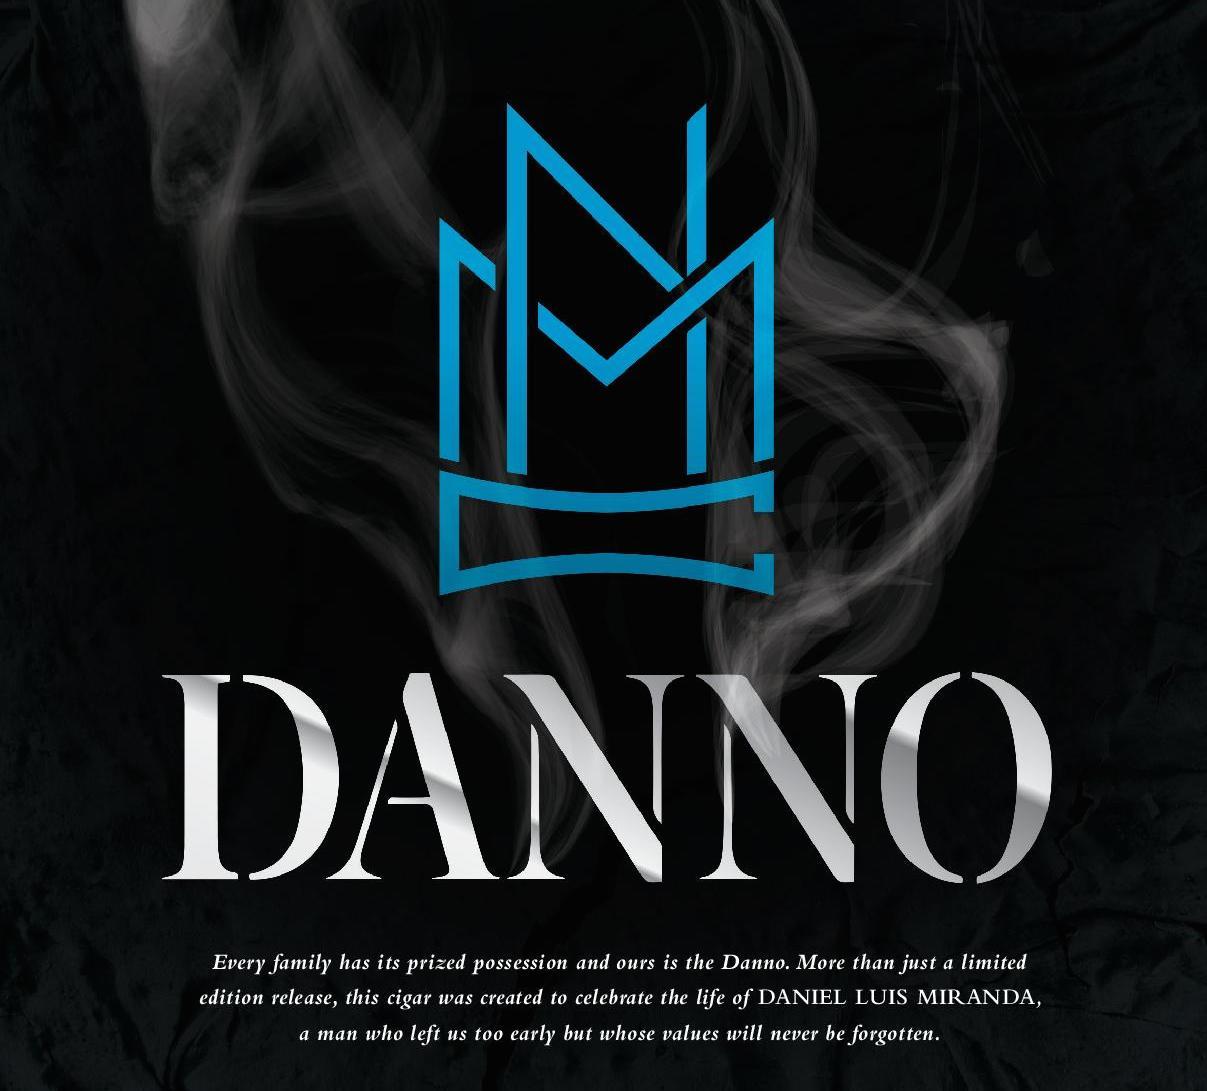 Cigar News: Nestor Miranda Collection Danno 2015 set to Launch